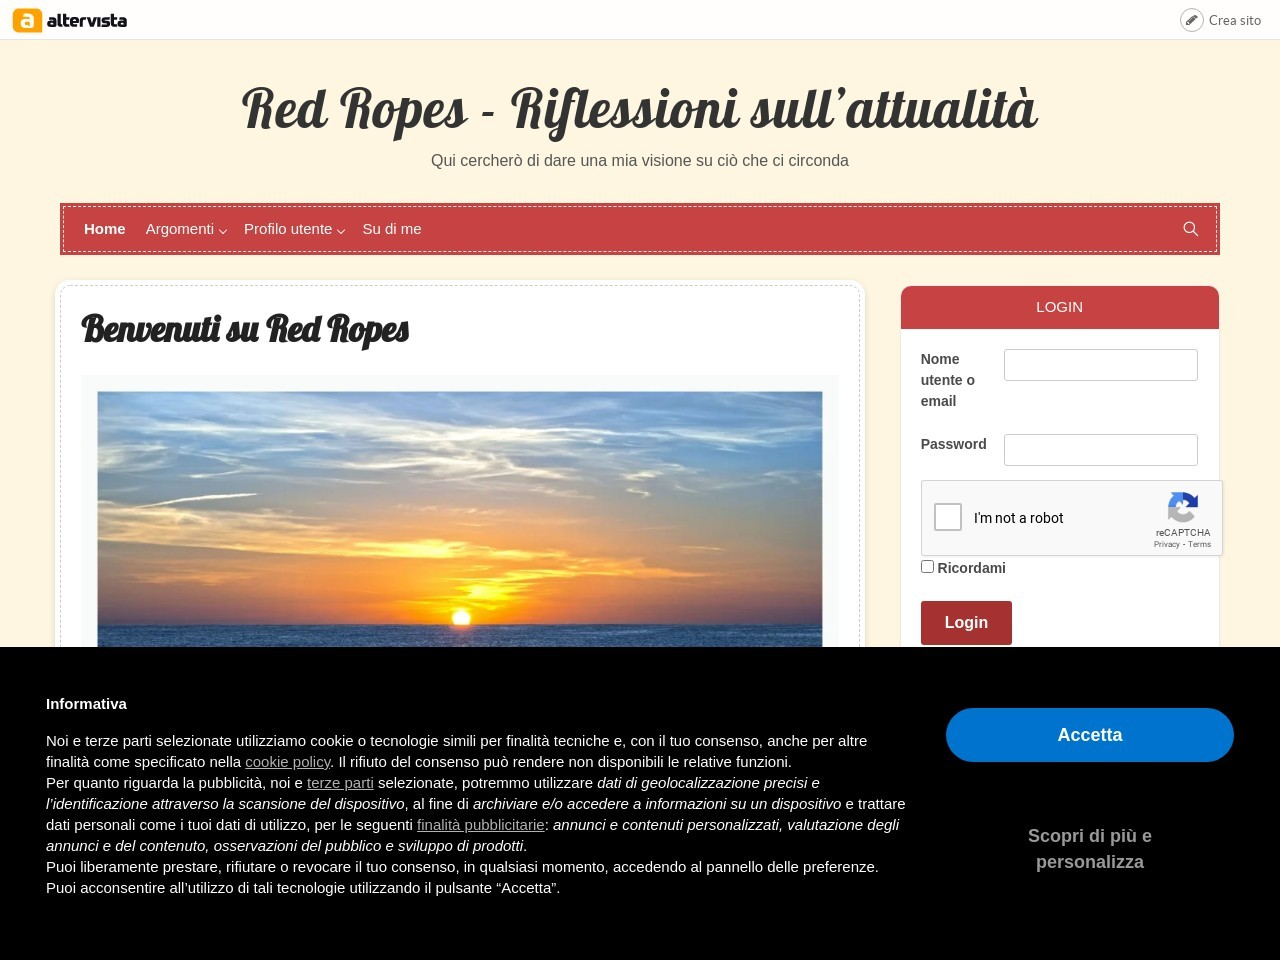 red-ropes-riflessioni-sullattualita